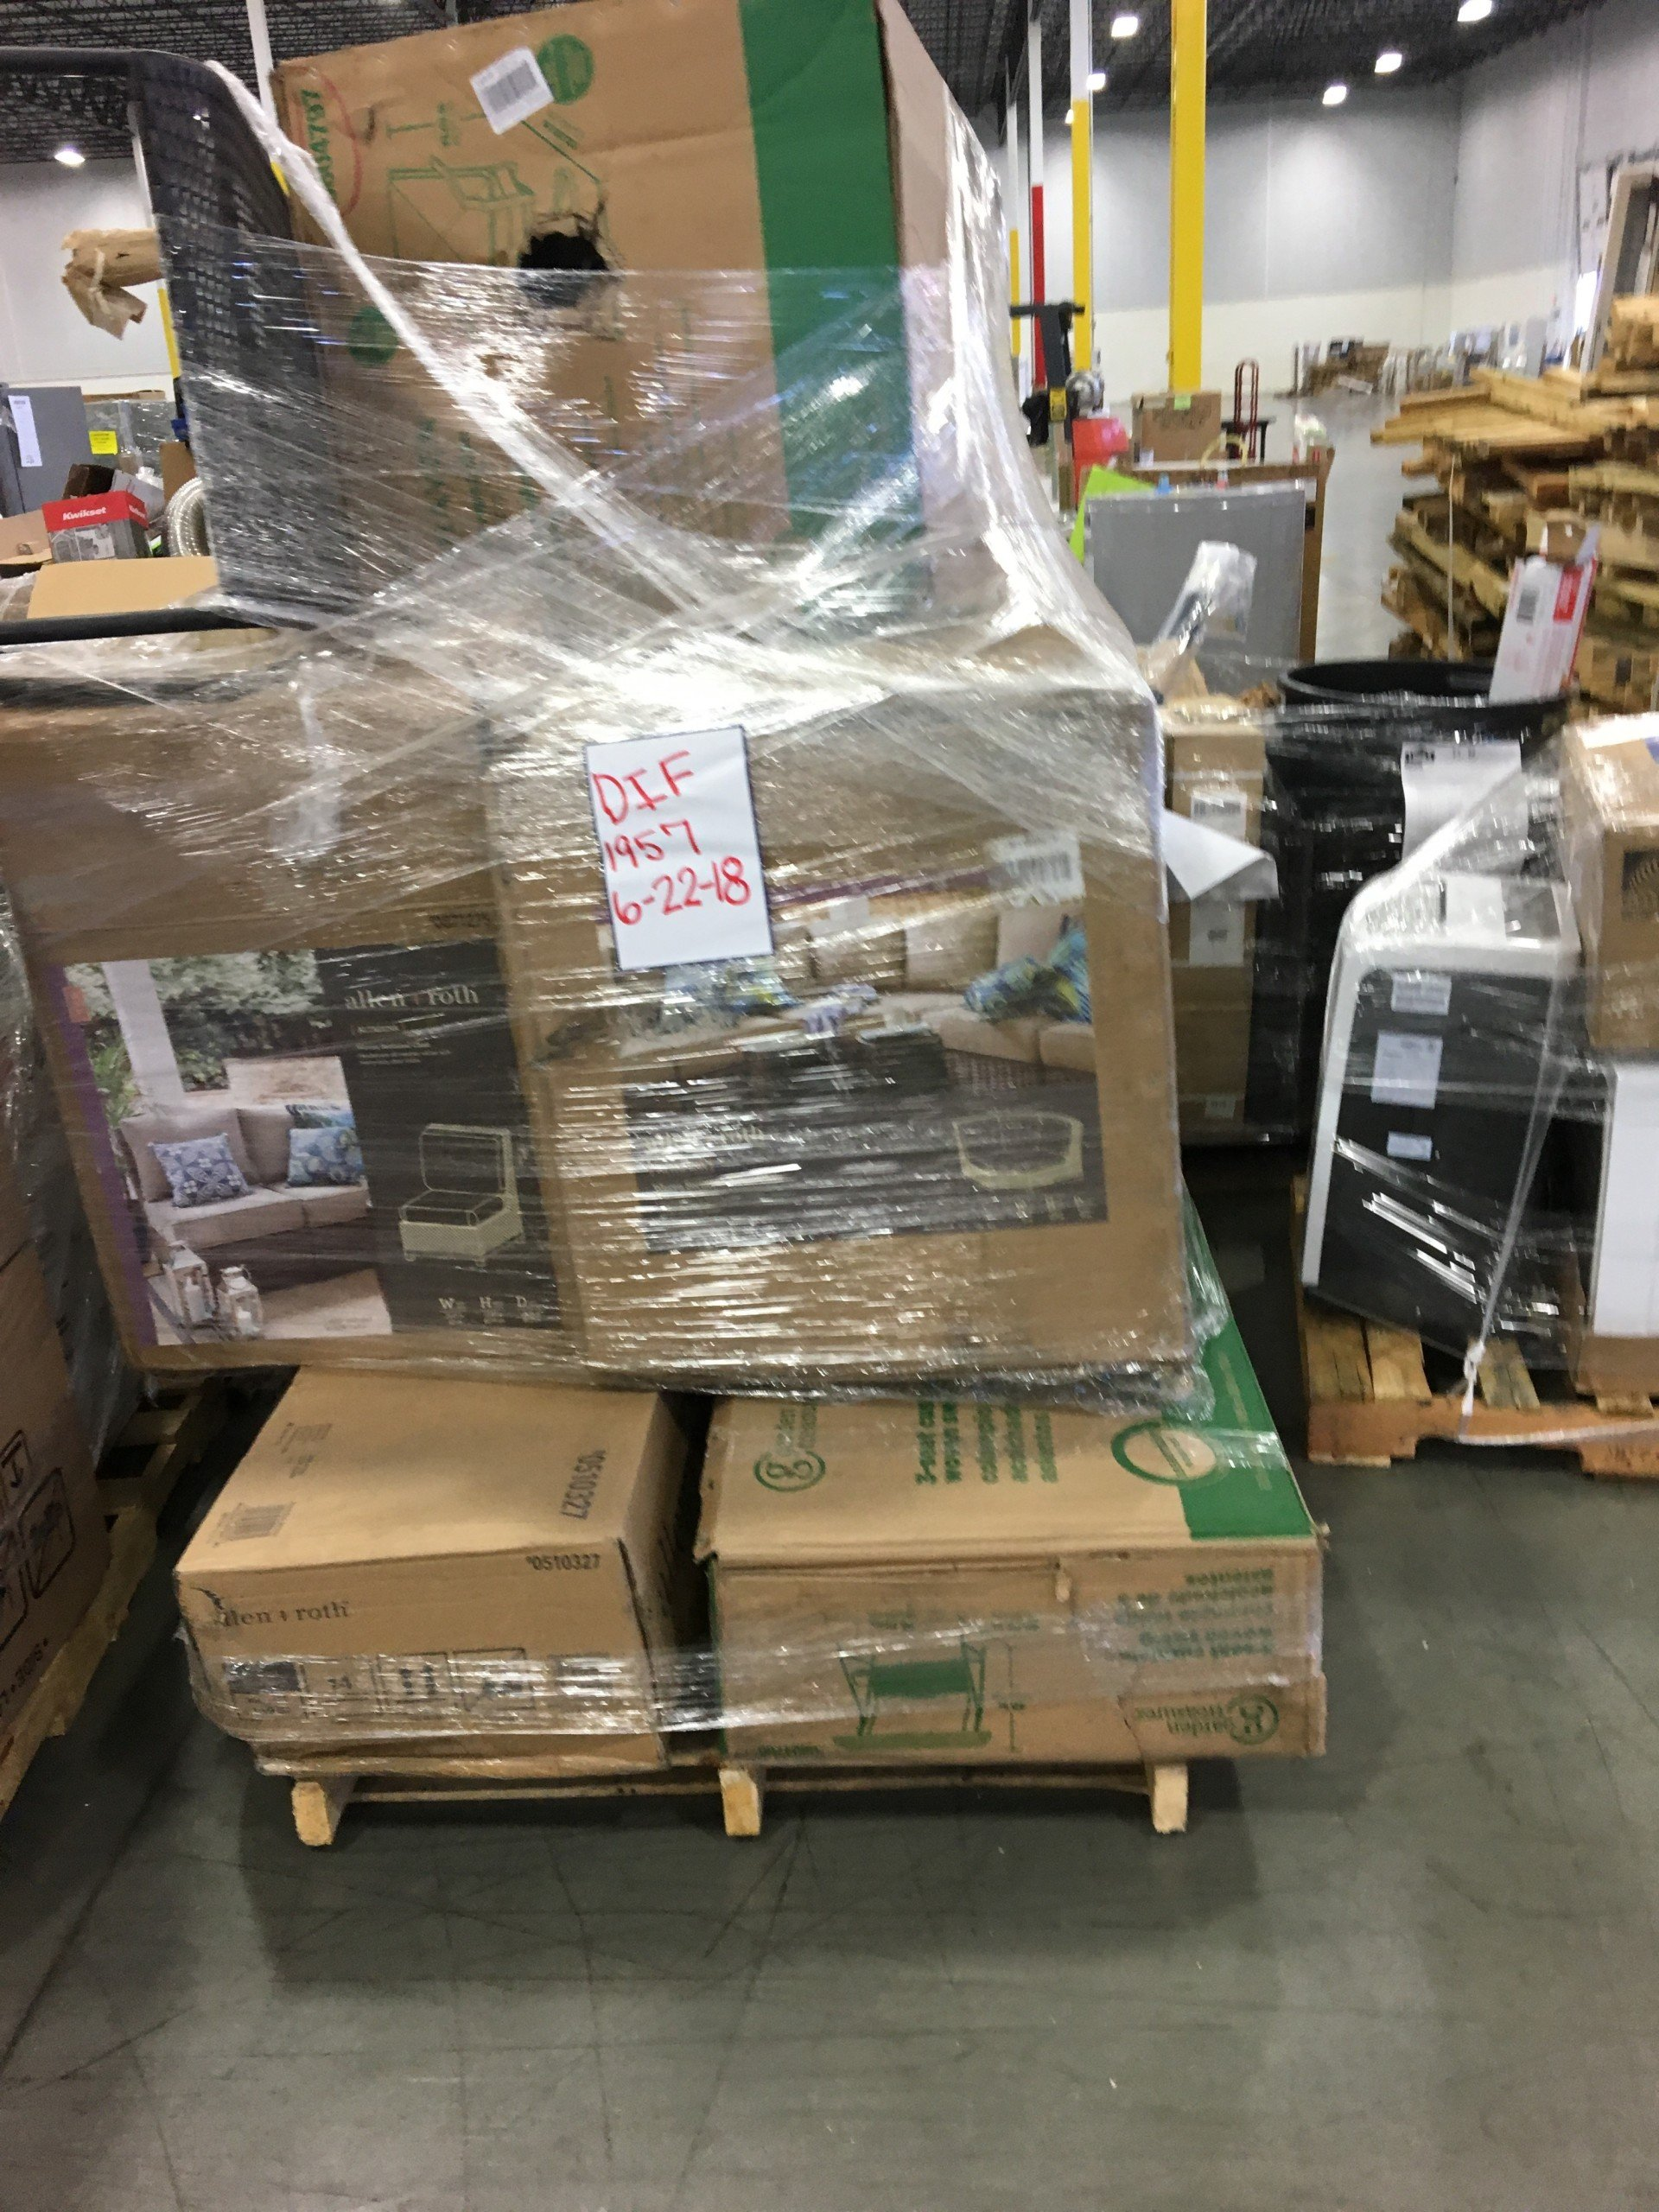 Lowe S Liquidation Tools Truckload Pallets Of Lowes